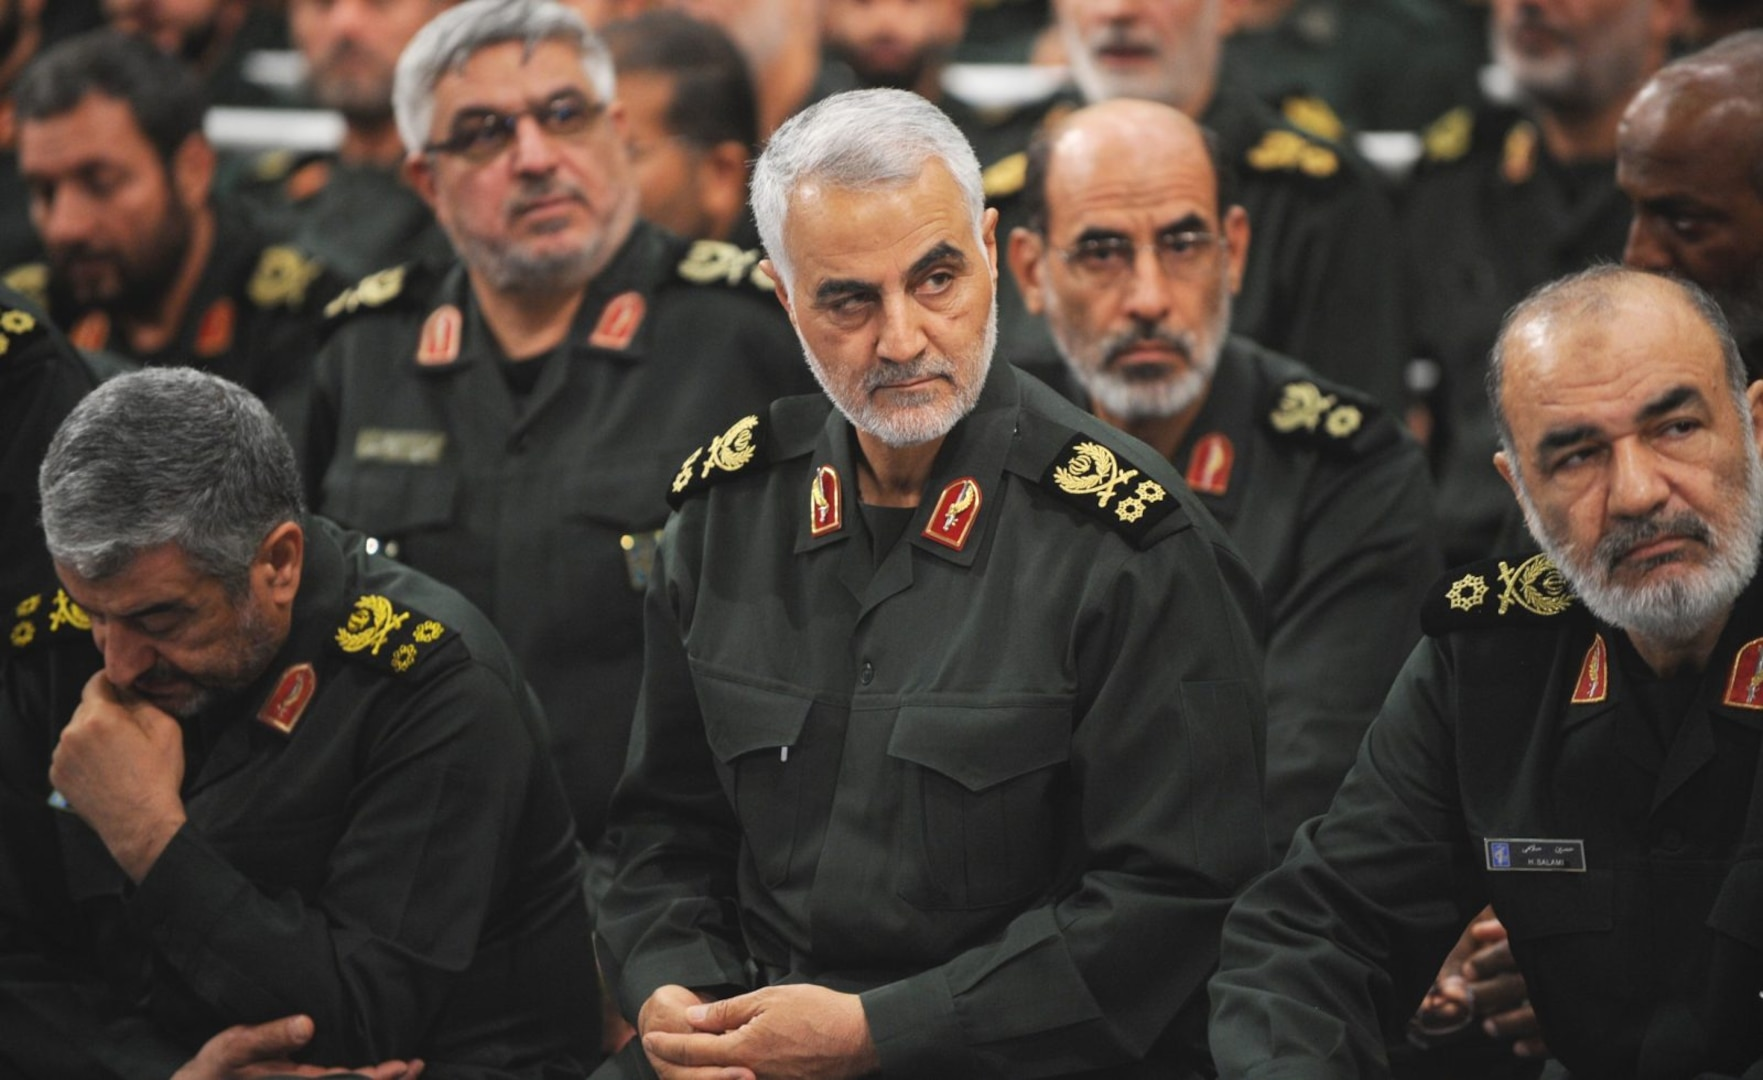 Iranian Quds Force commander Qassem Soleimani attends Iranian supreme leader Ayatollah Ali Khamenei's meeting with the Islamic Revolution Guards Corps in Tehran, Iran, on September 18, 2016